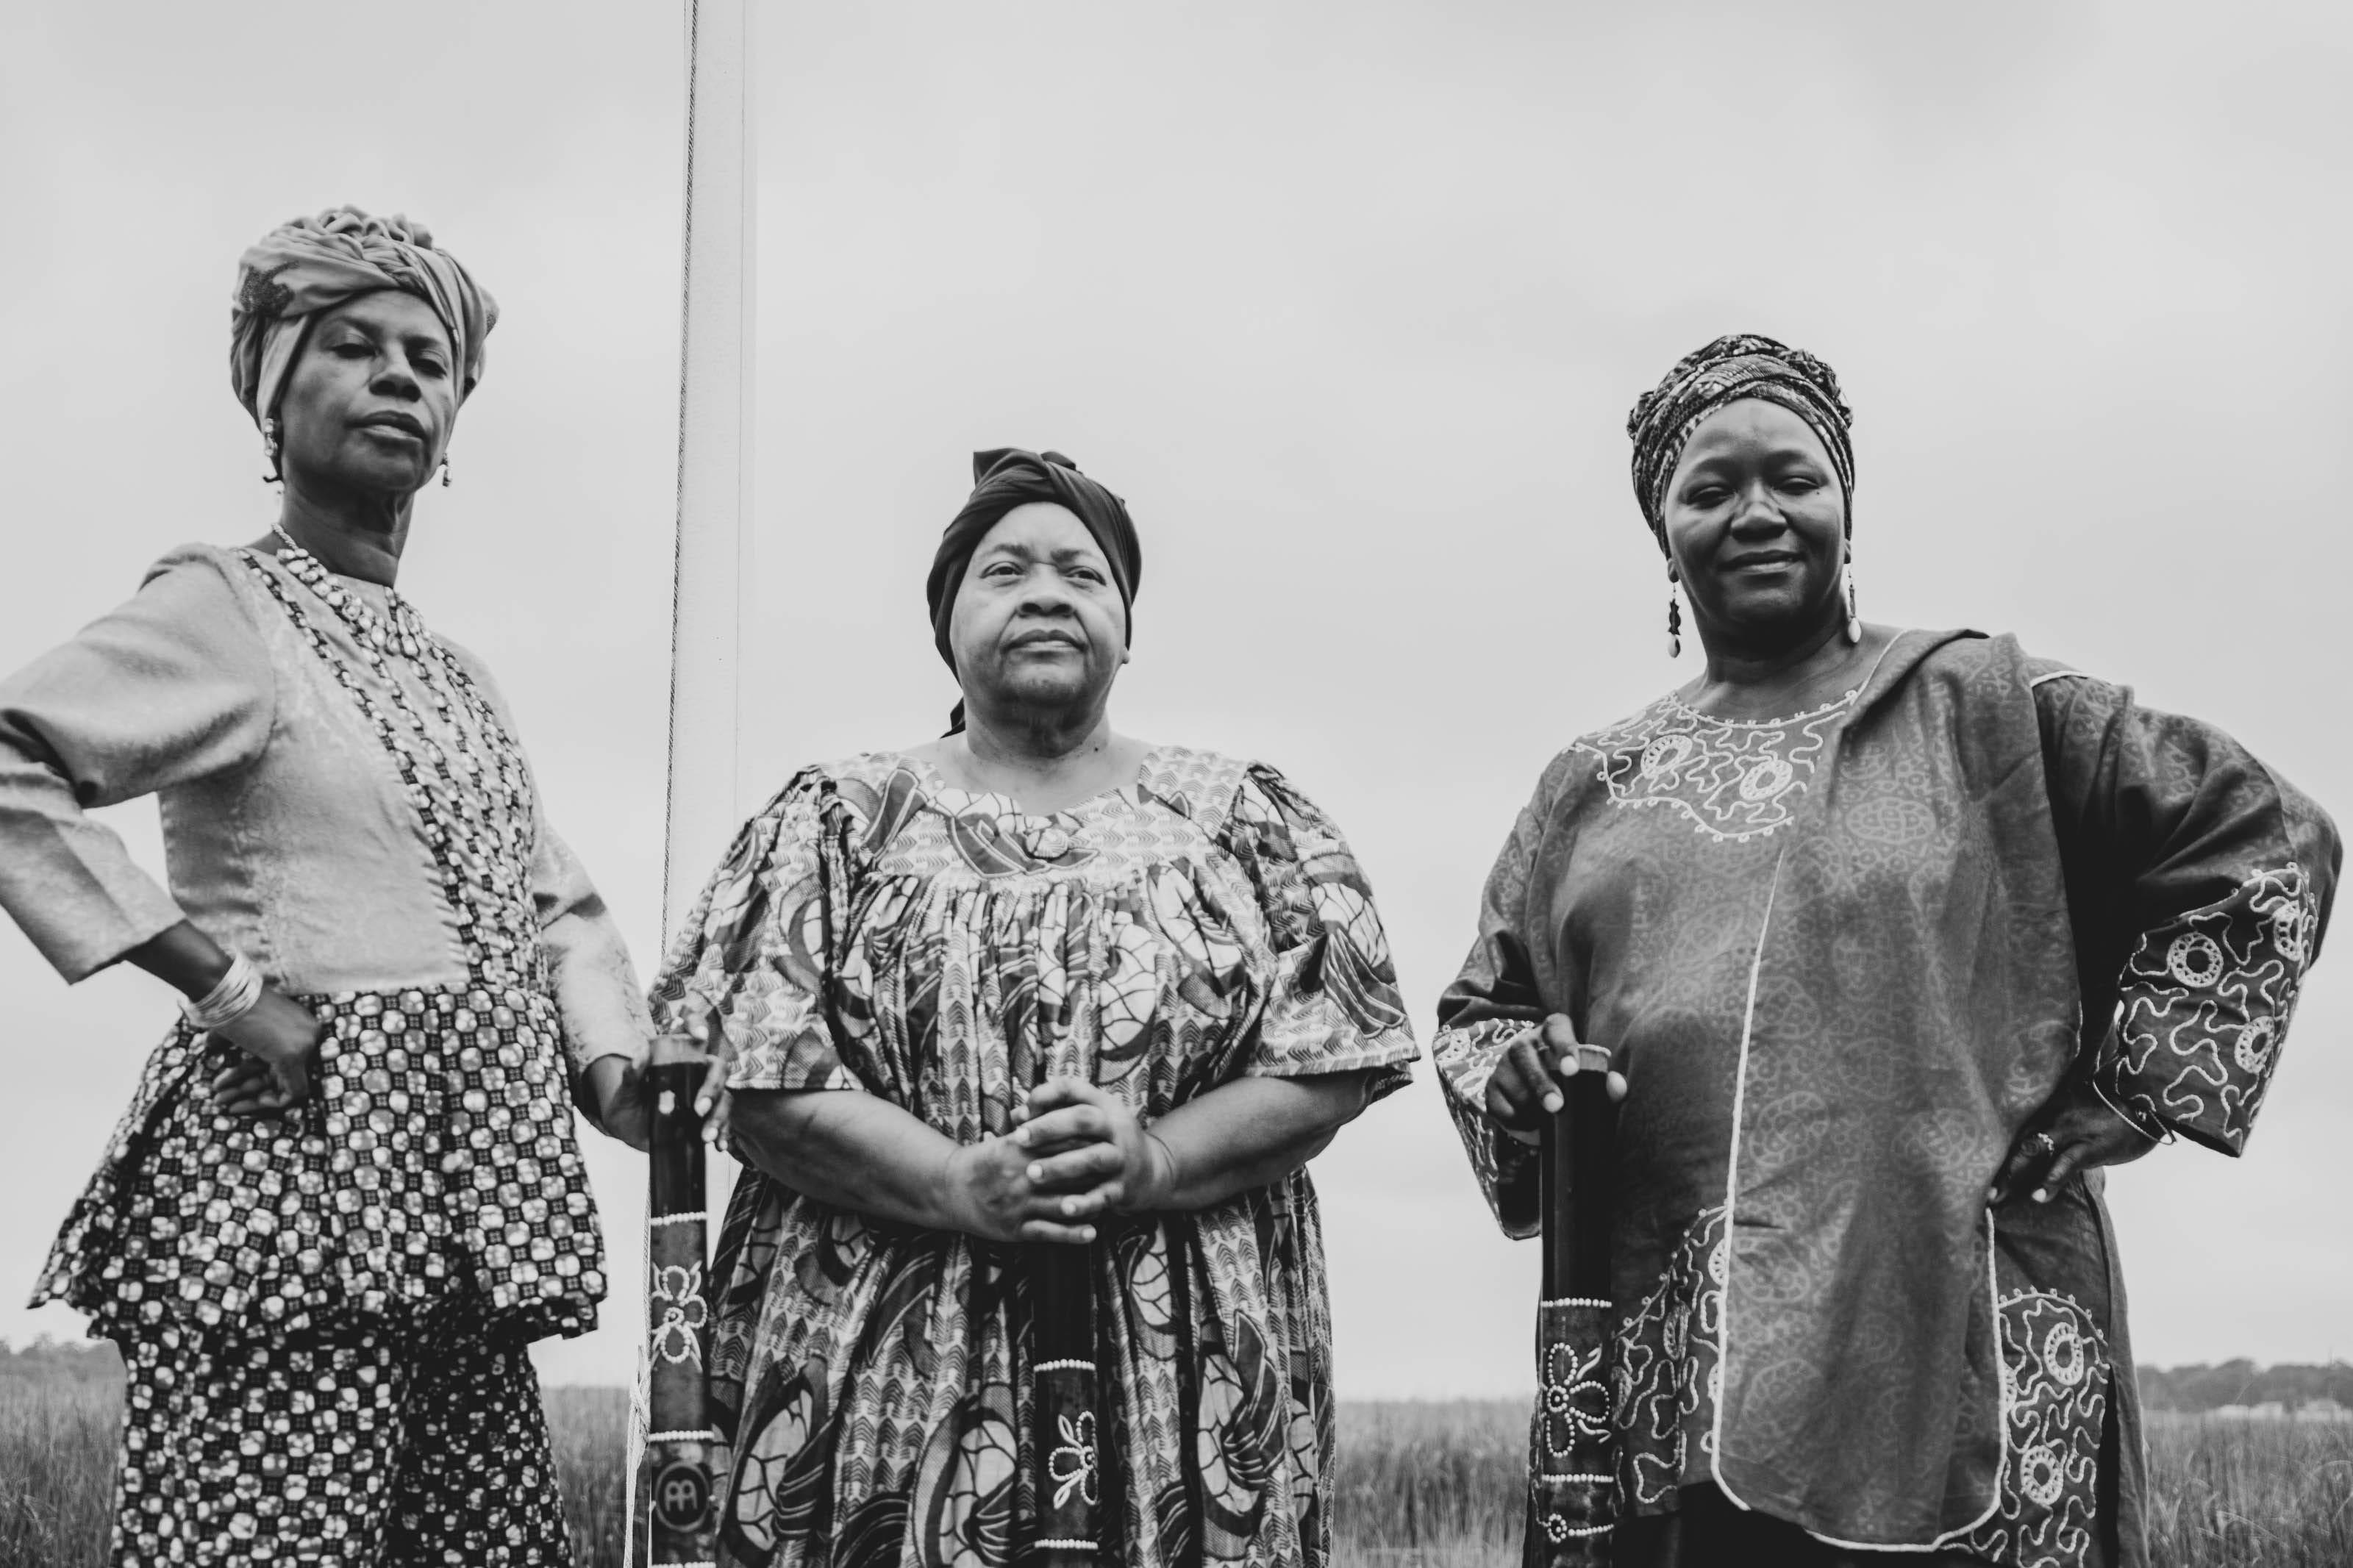 From left: Rosalyn Rouse, Pastor Linnie Kelly and Patt Gunn